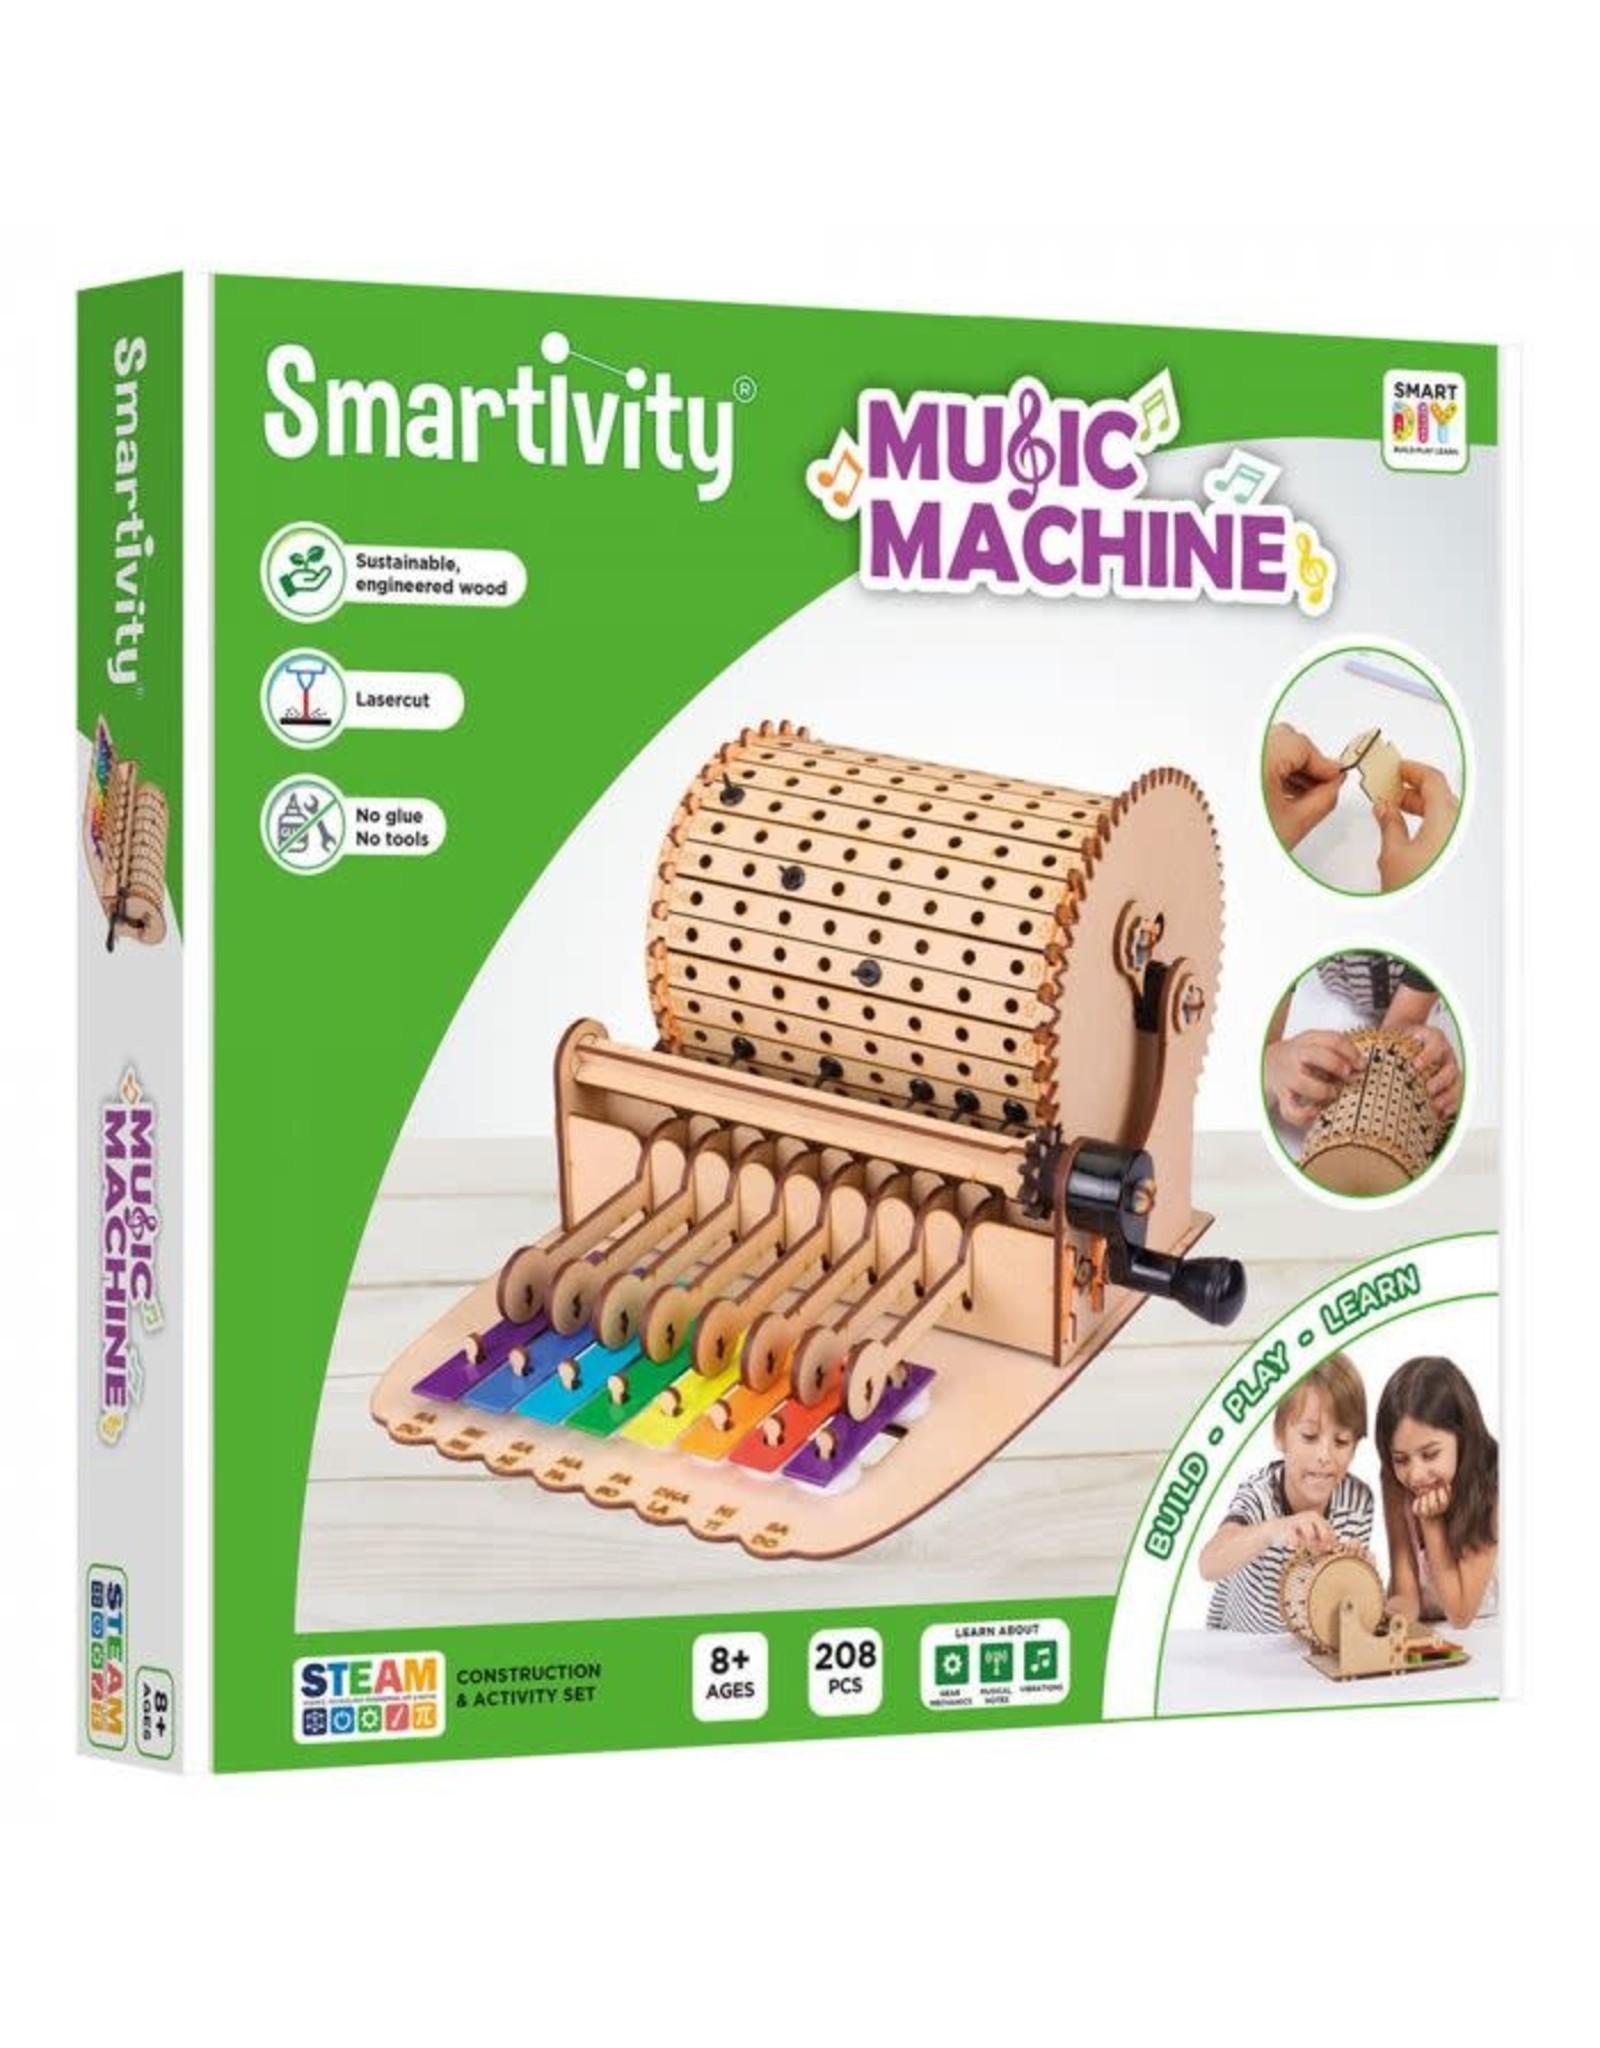 Smartivity Smartivity - Music Machine